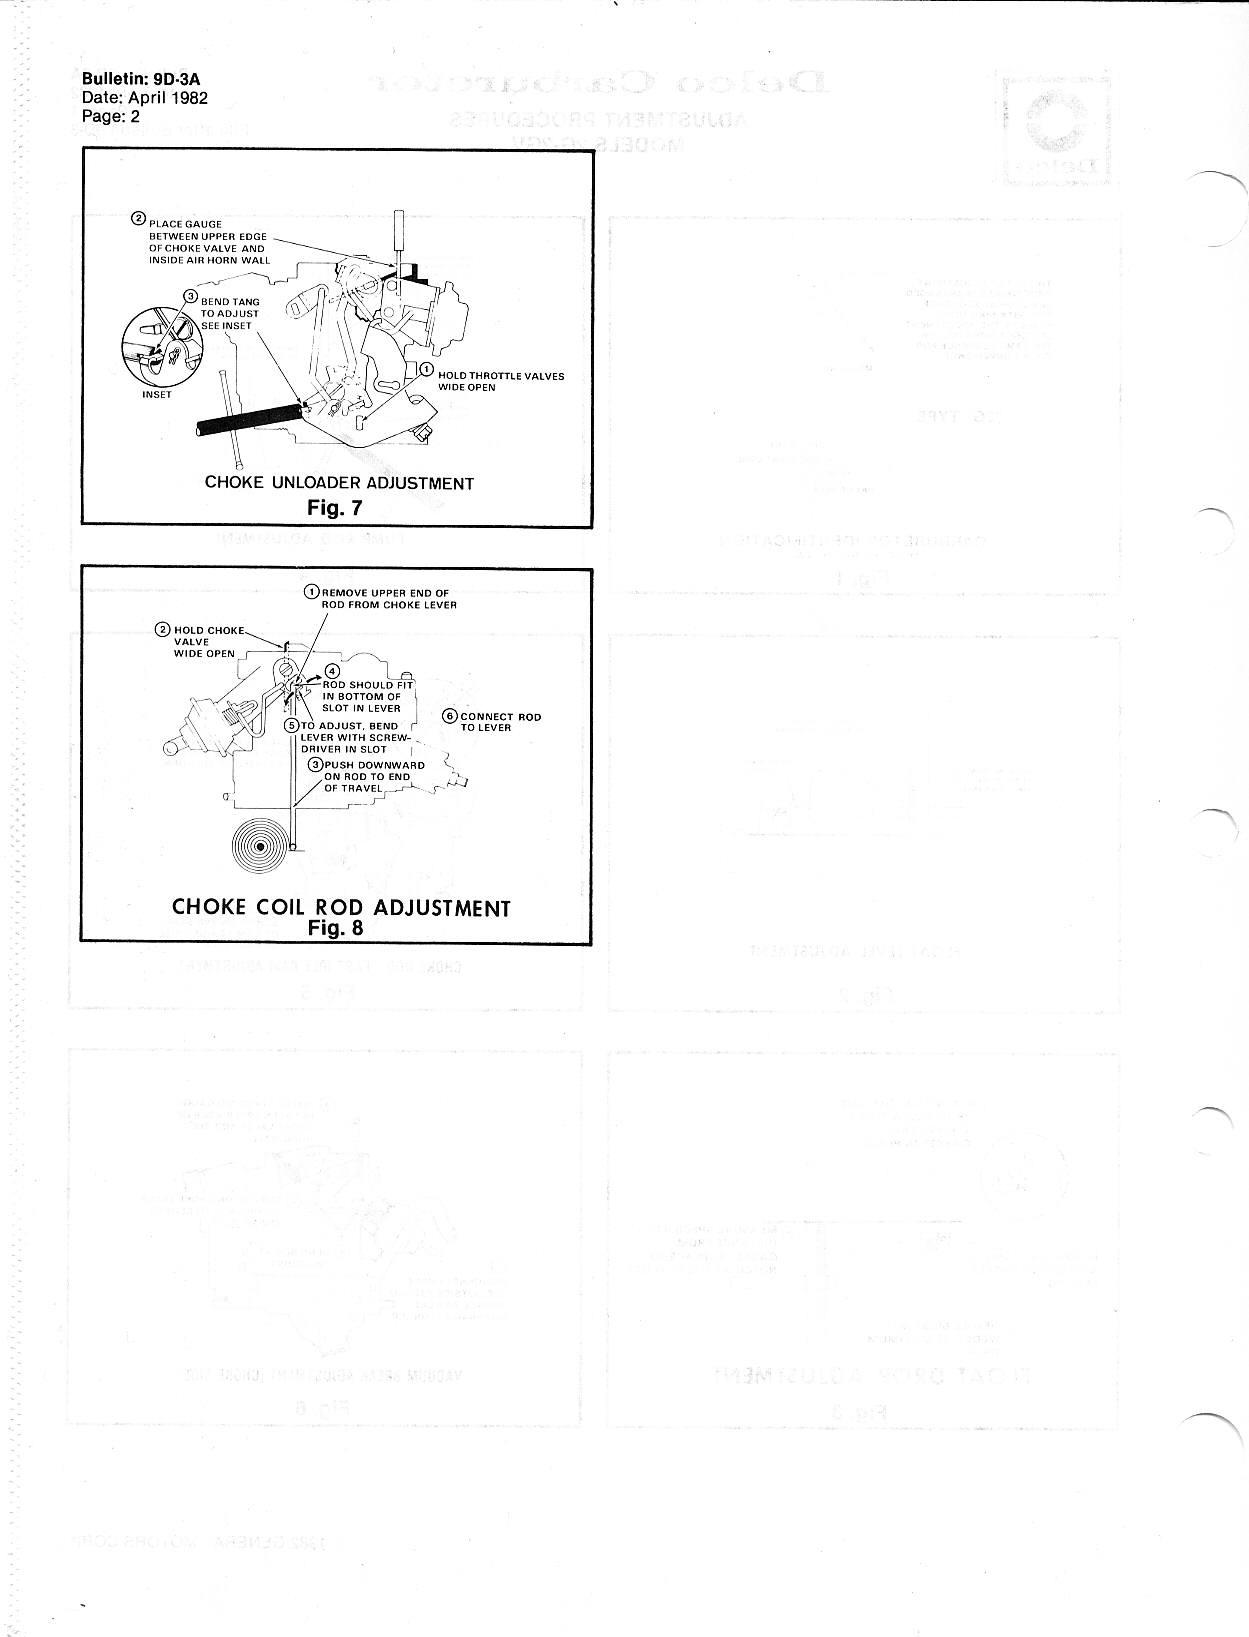 1964 Delco Rochester 4g Service Manual Roch4g 0016jpg